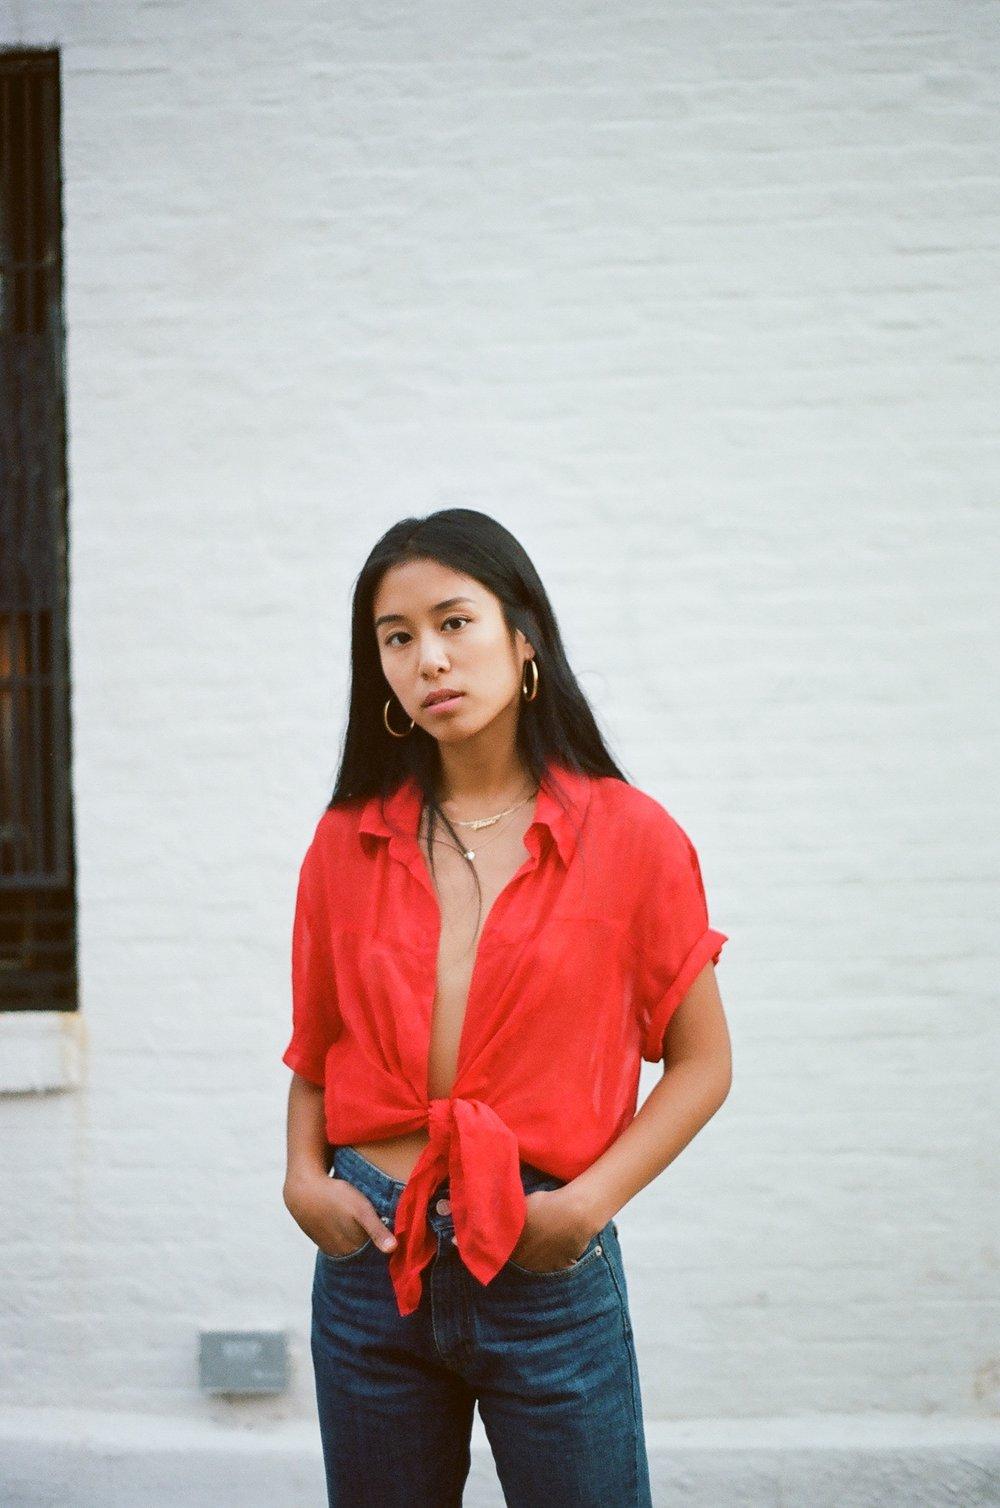 Kristen_Lam_Vintage_Red_Shirt